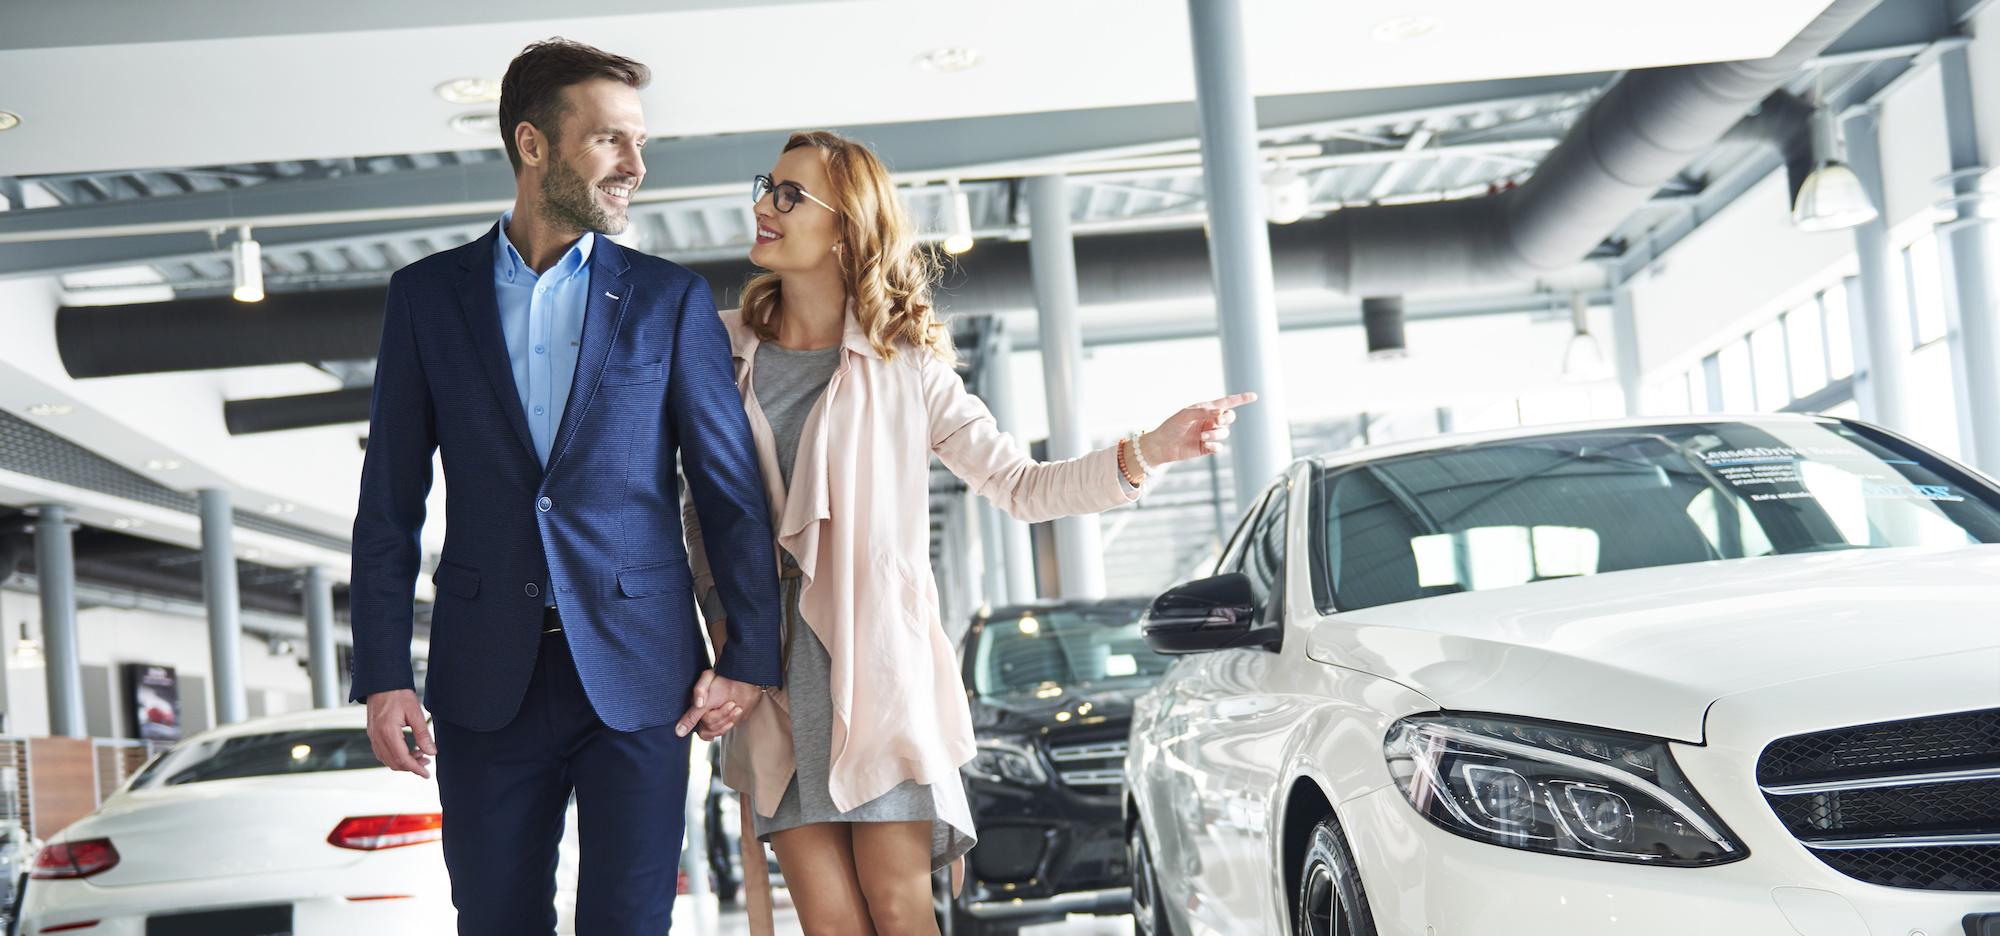 5 inspiring car marketing